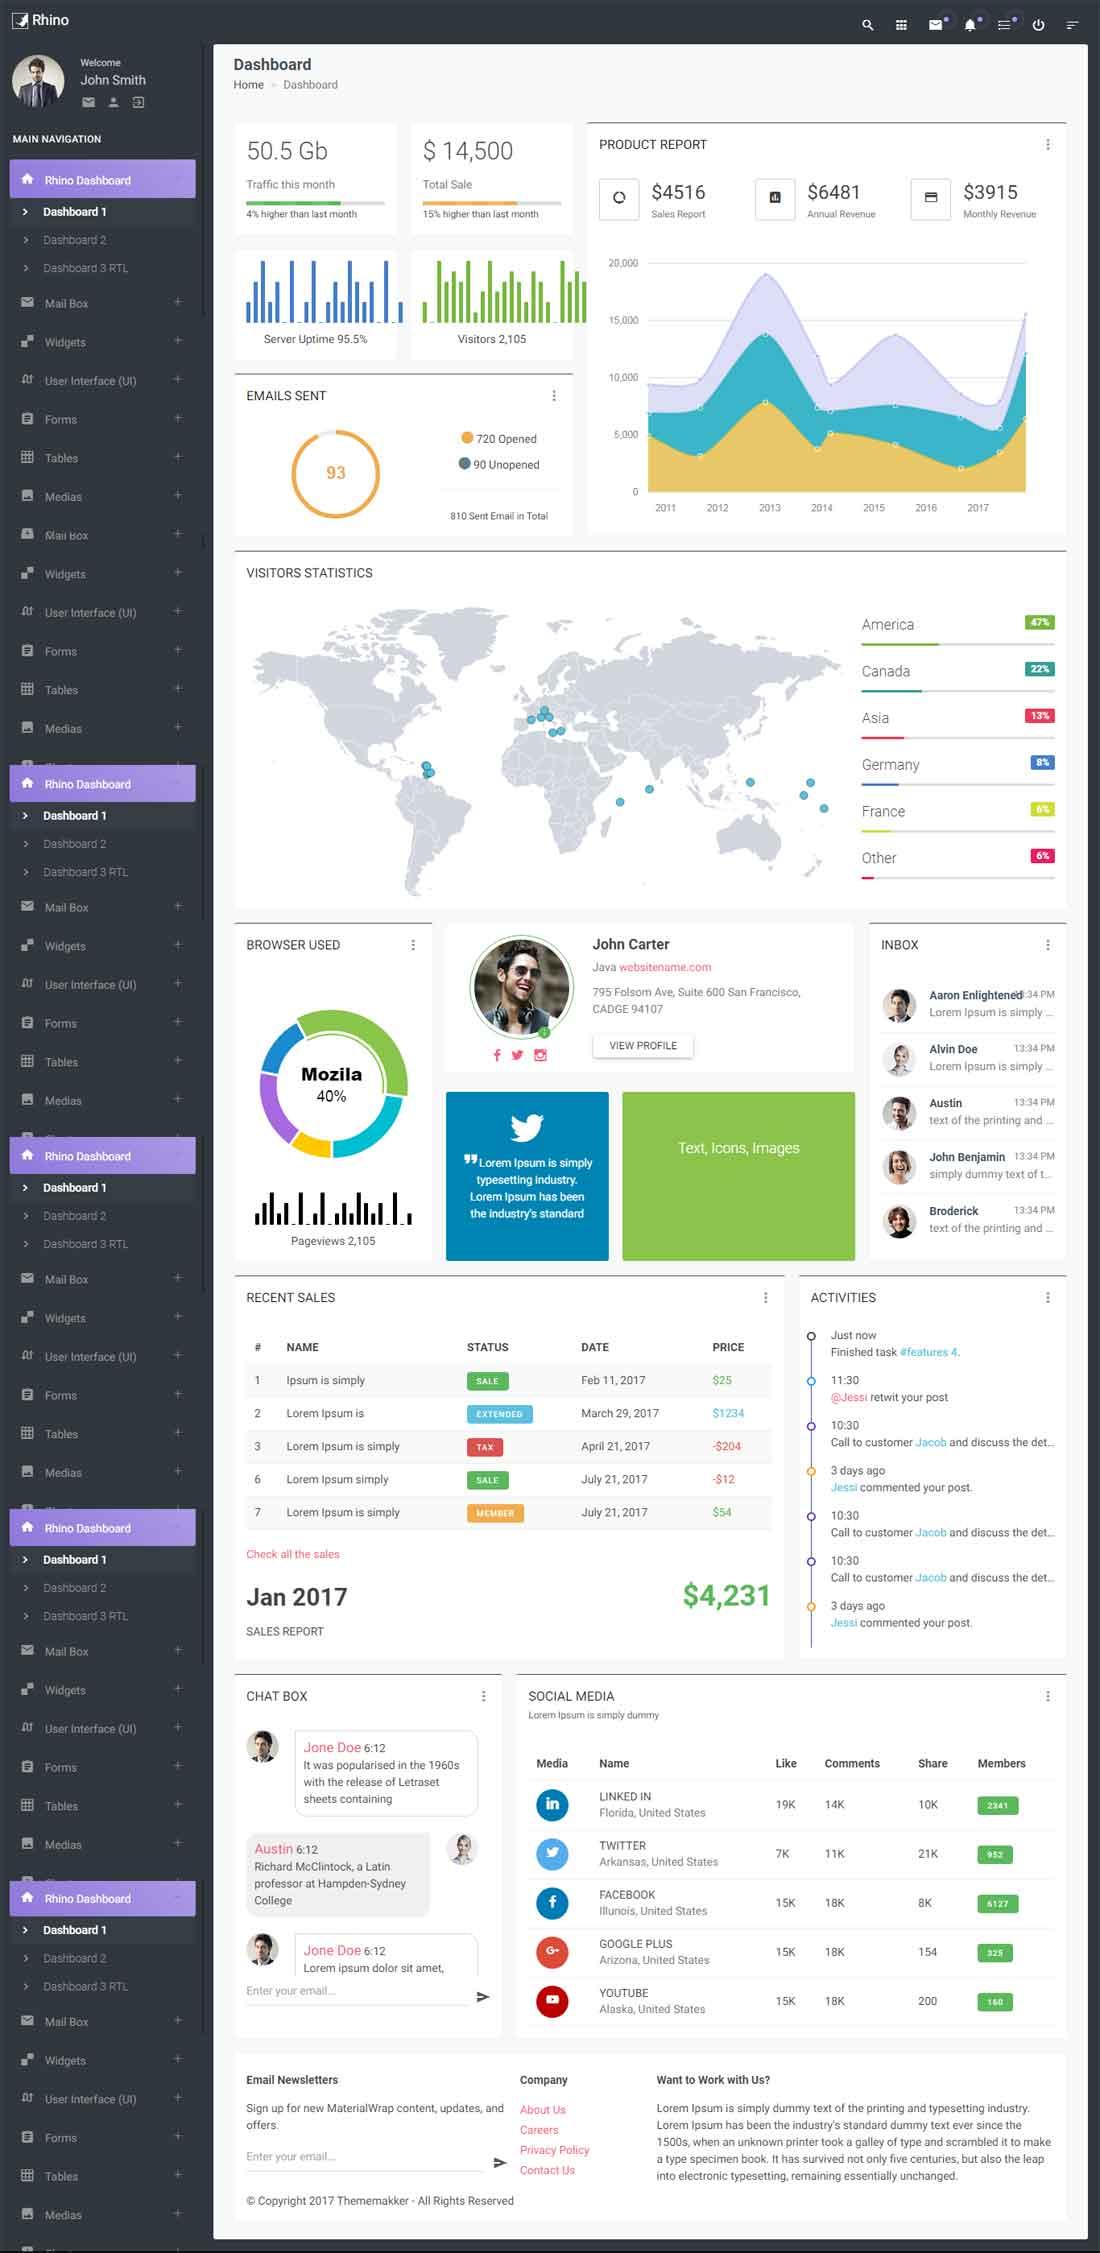 Rhino – Responsive Material Design Dashboard Theme